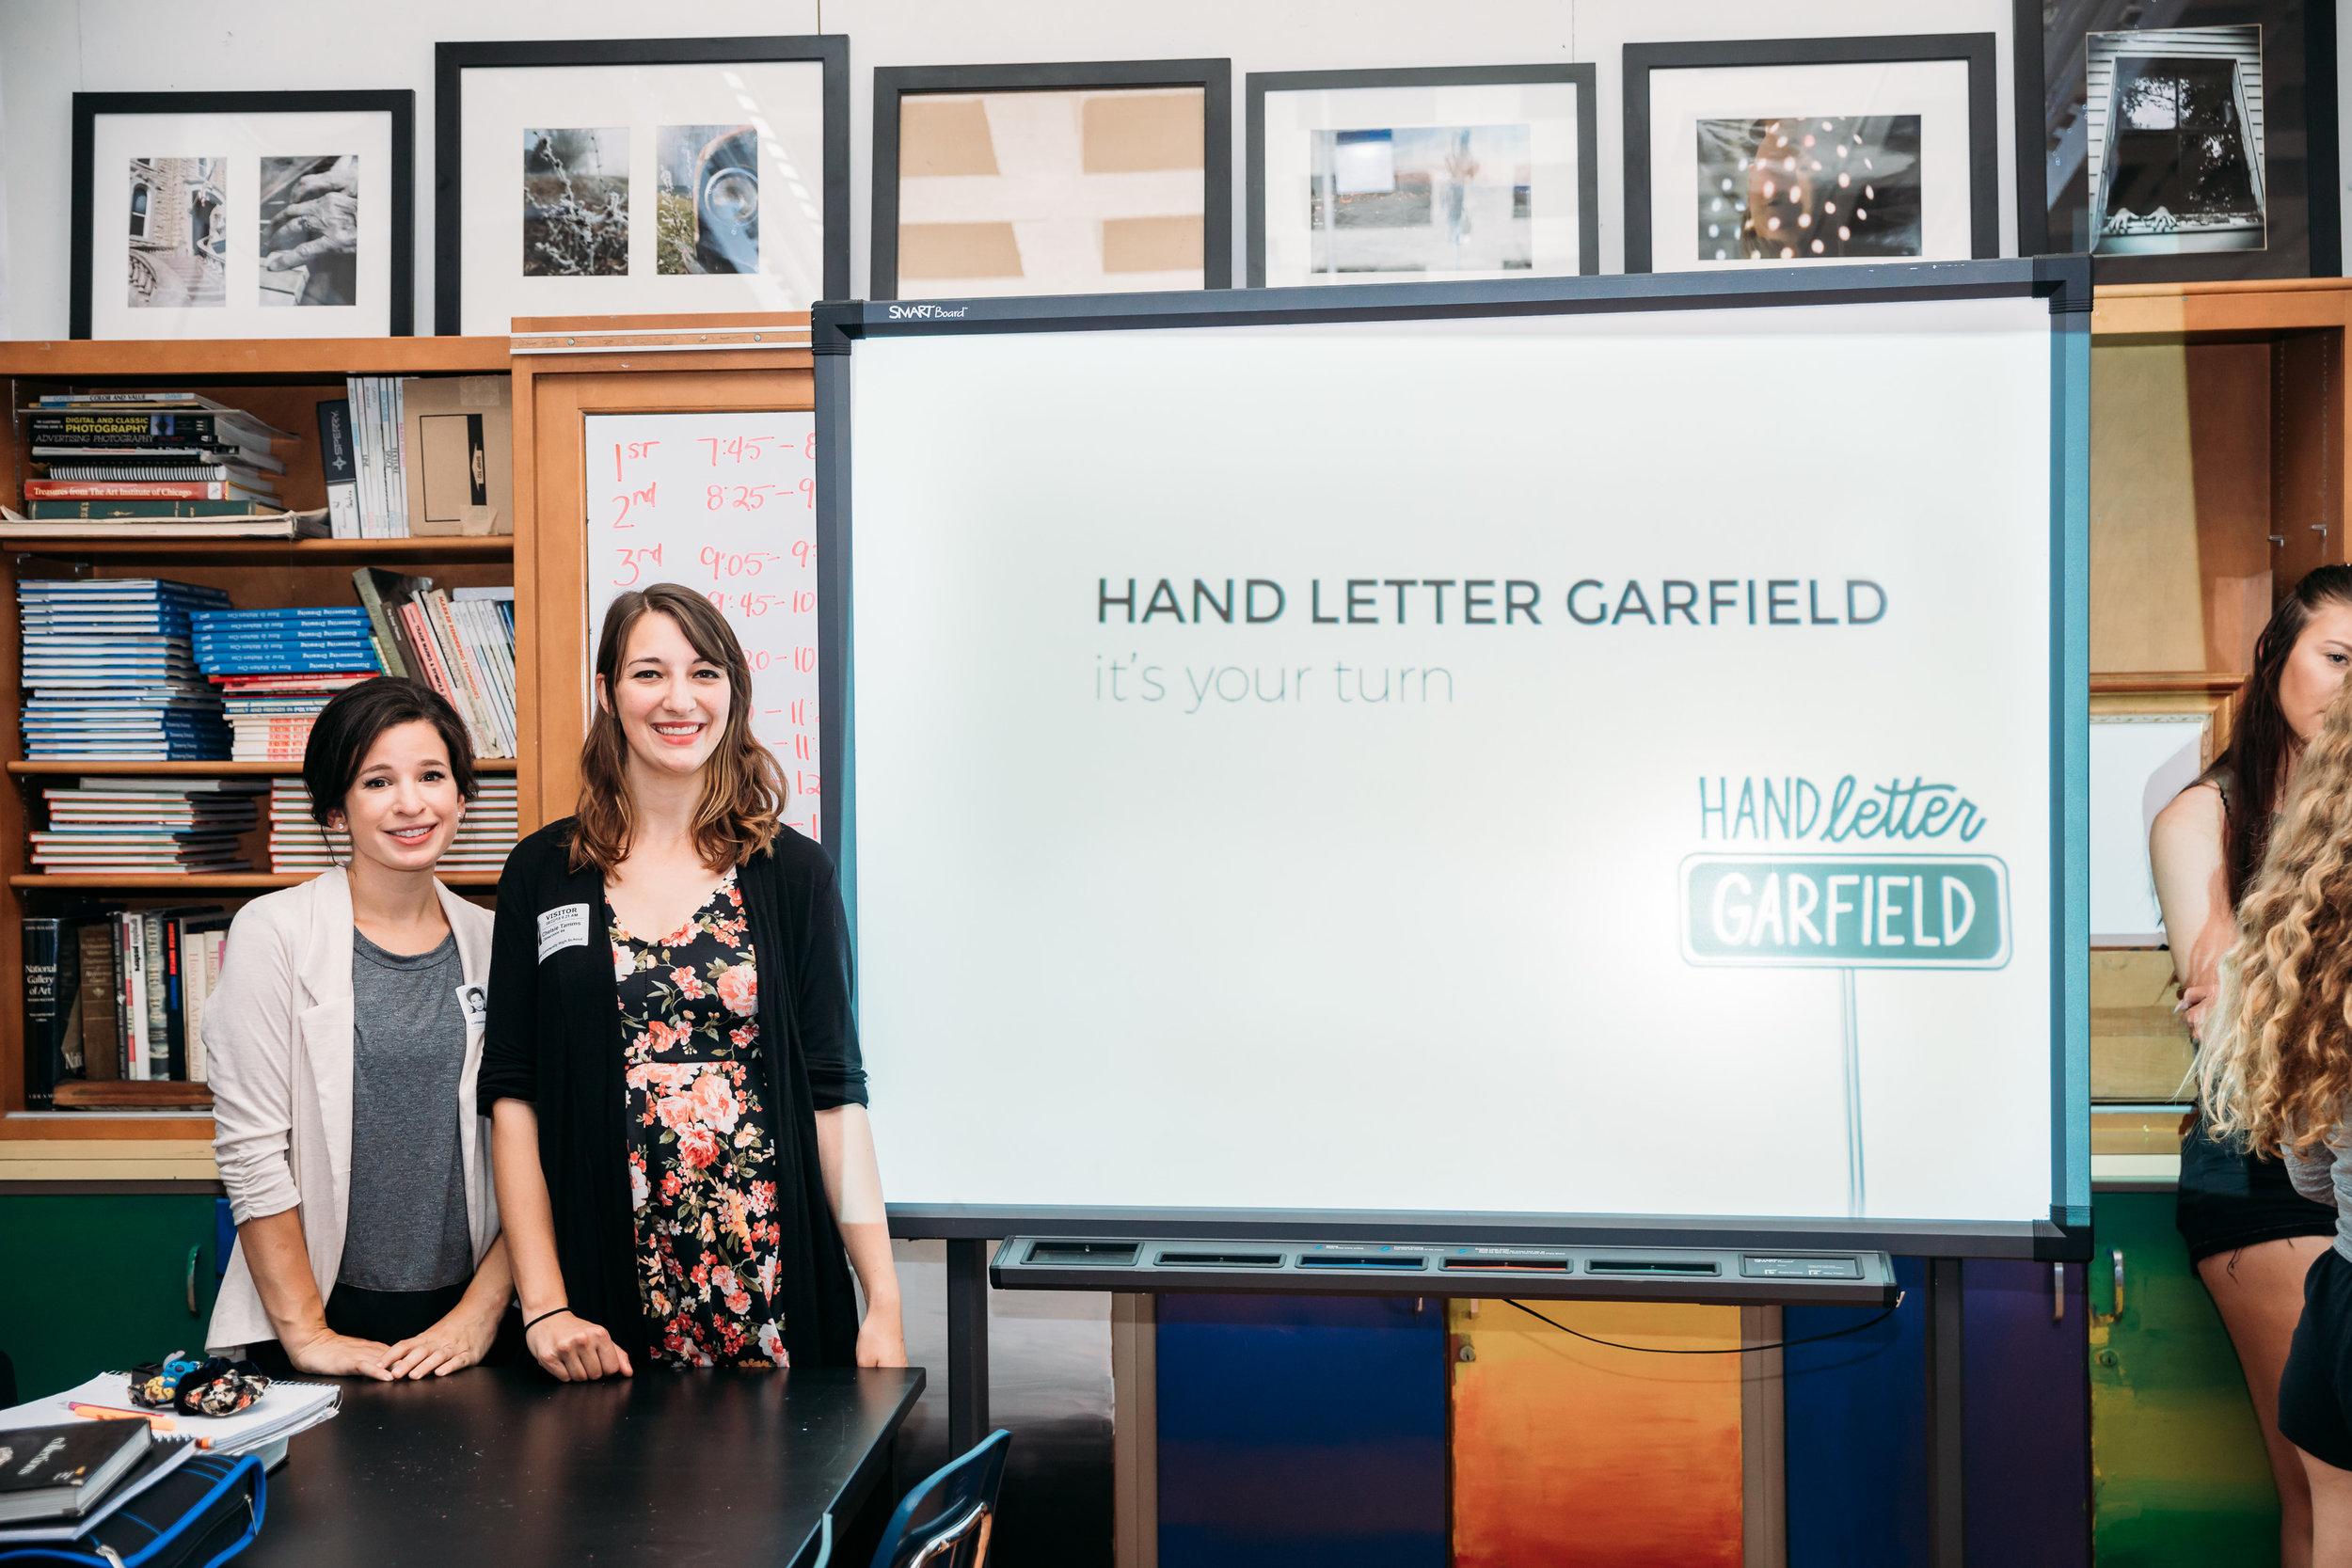 Hand Letter Garfield